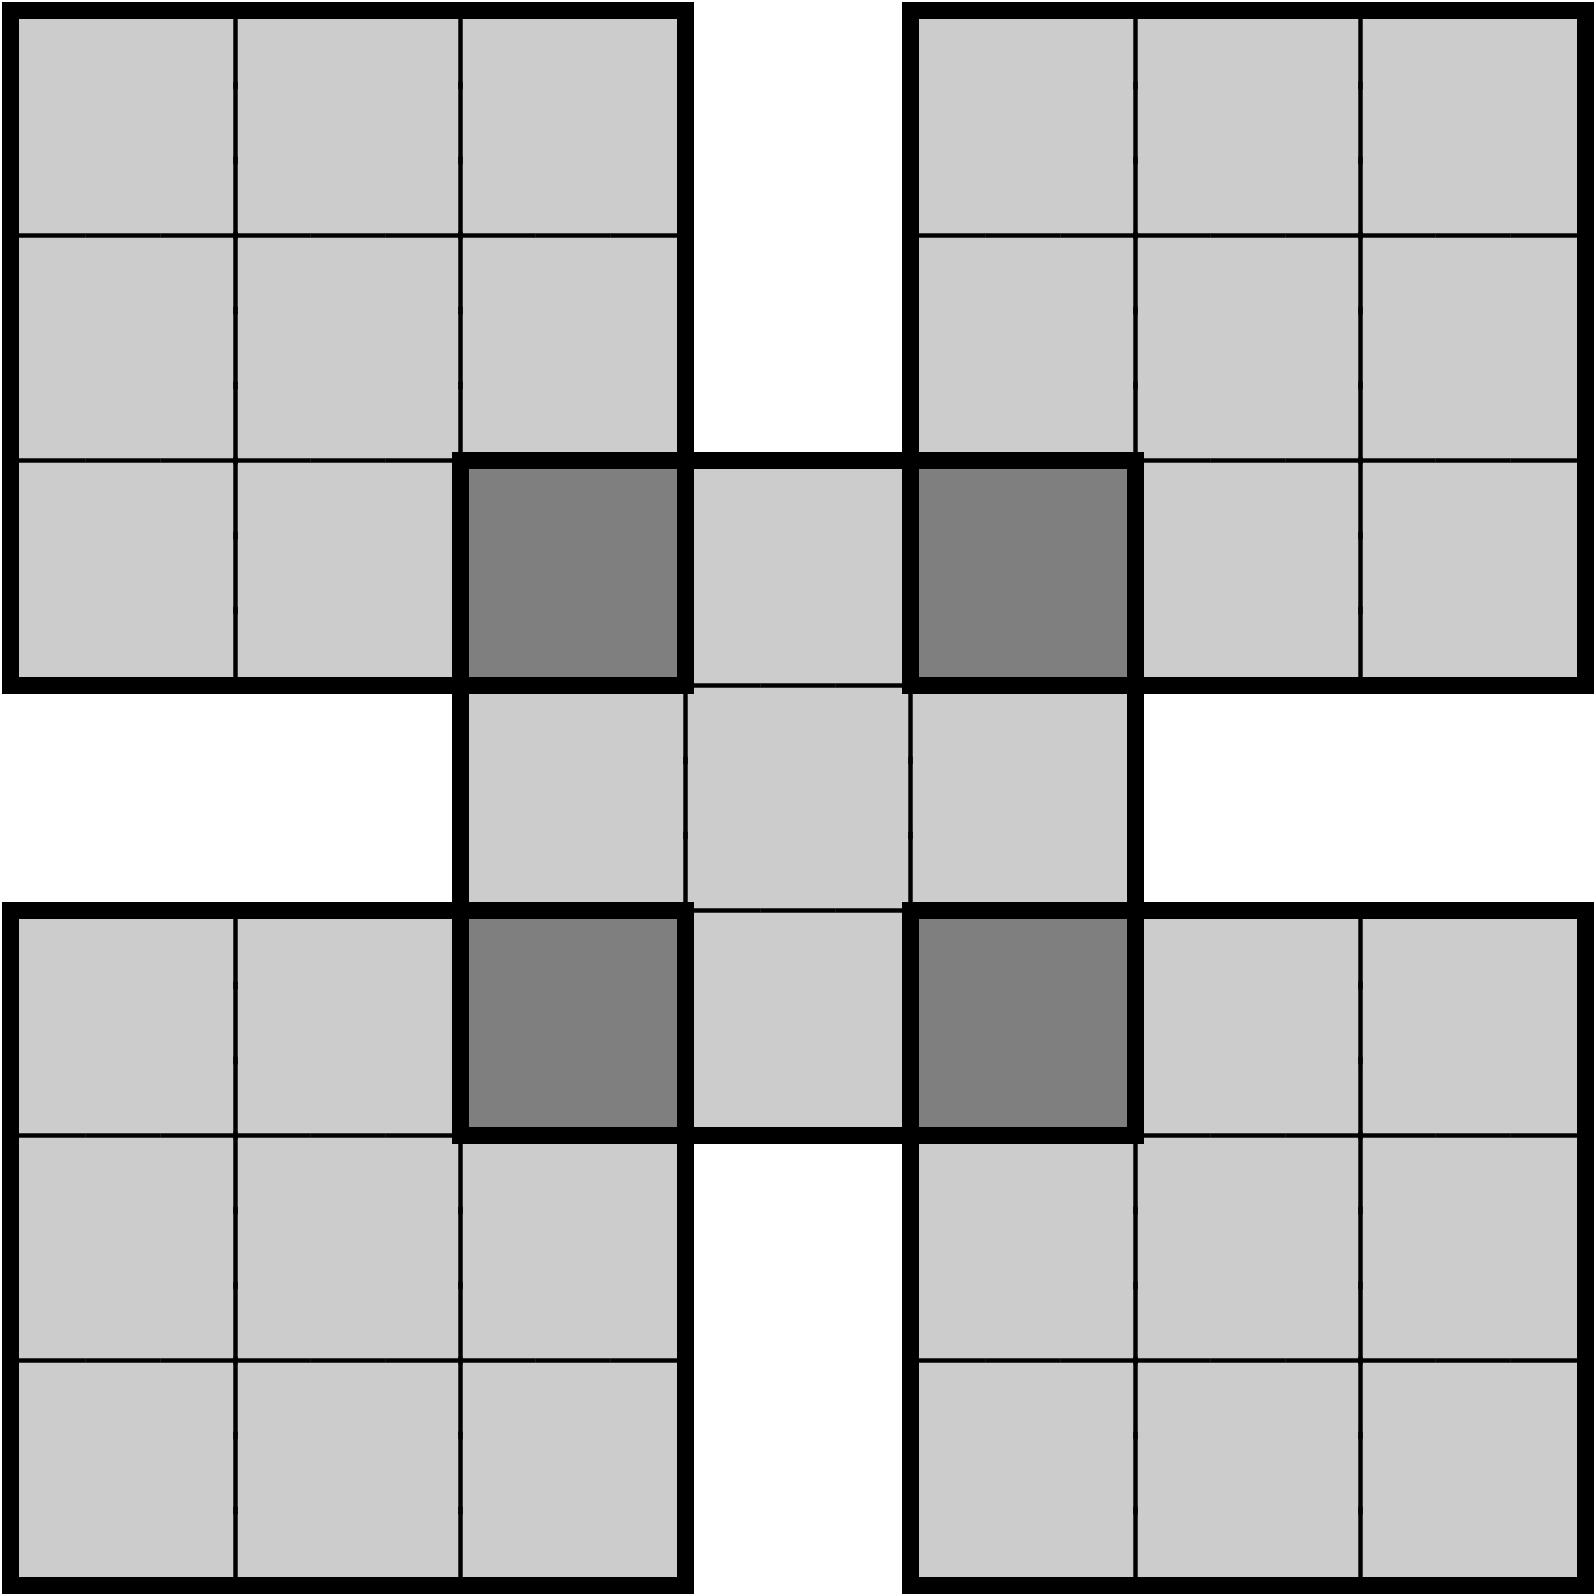 The Daily Sudoku